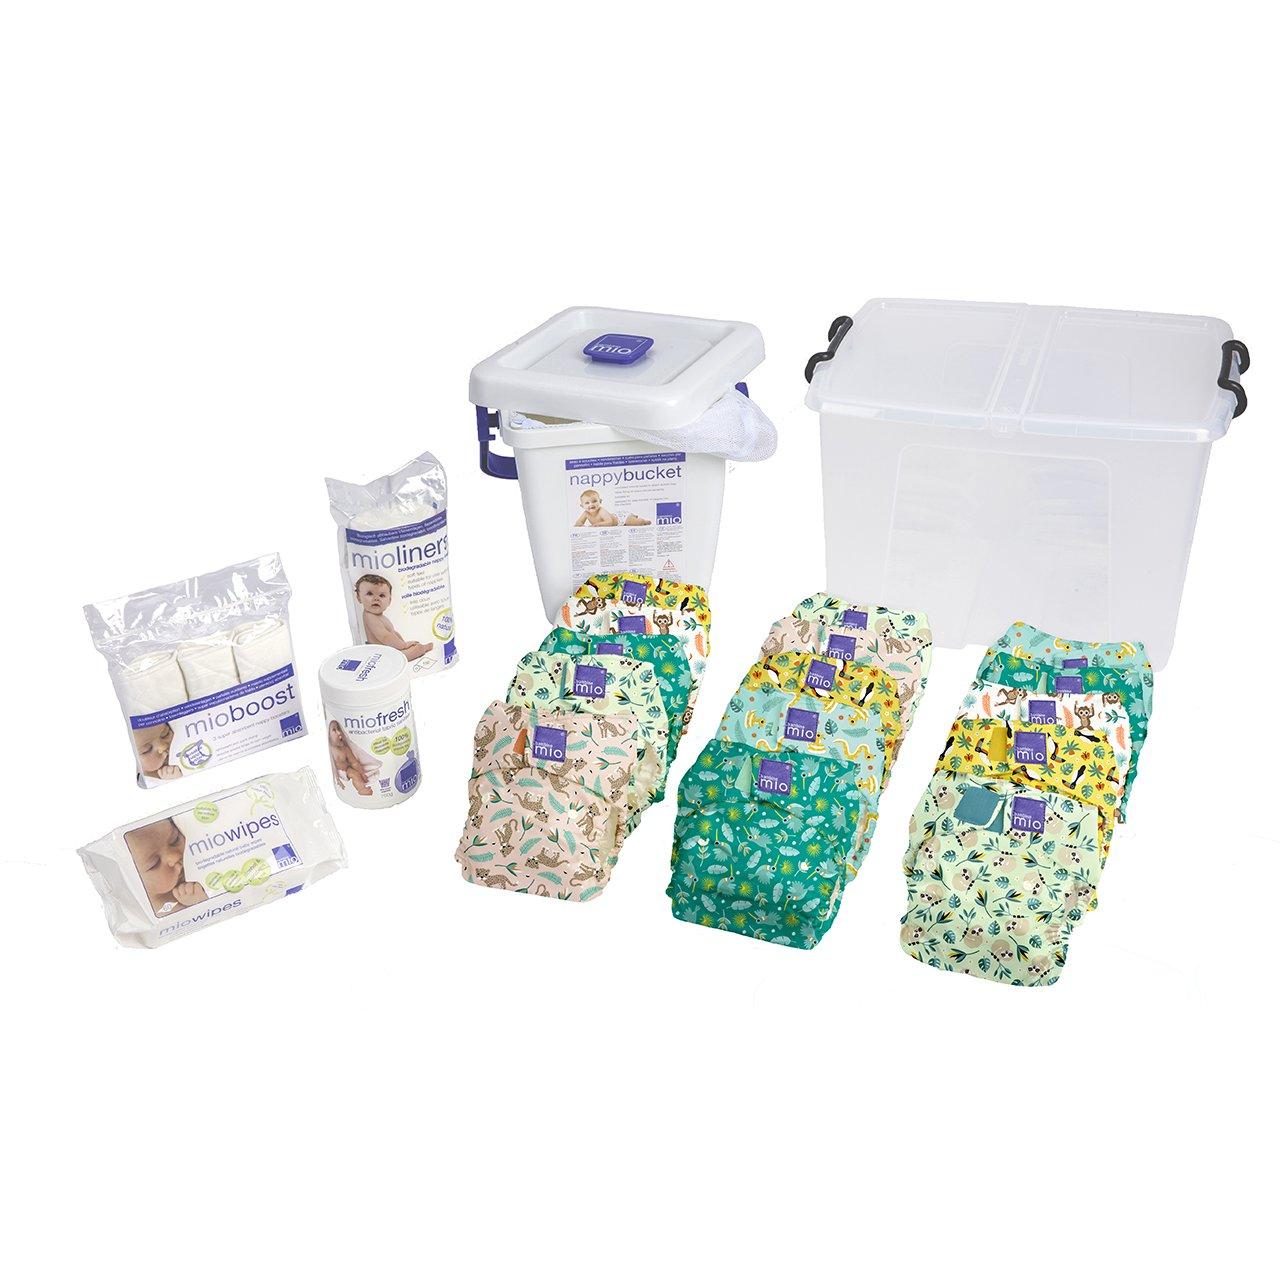 Bambino Mio Miosolo Premium Birth to Potty Pack, Rainforest